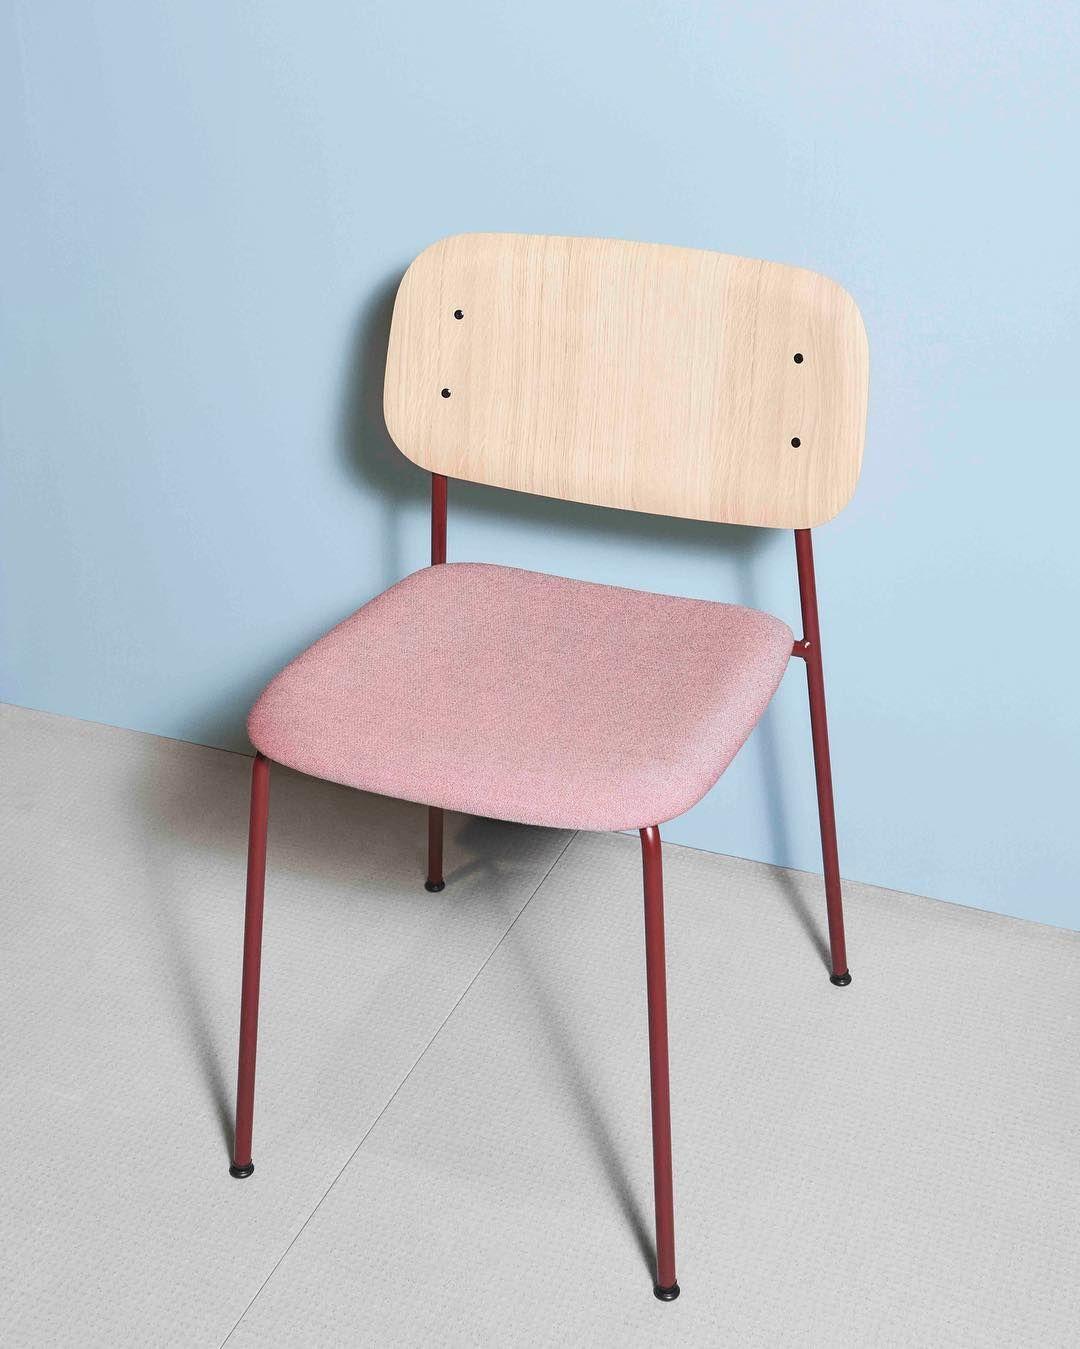 54 Best chair design images | Chair design, Chair, Design